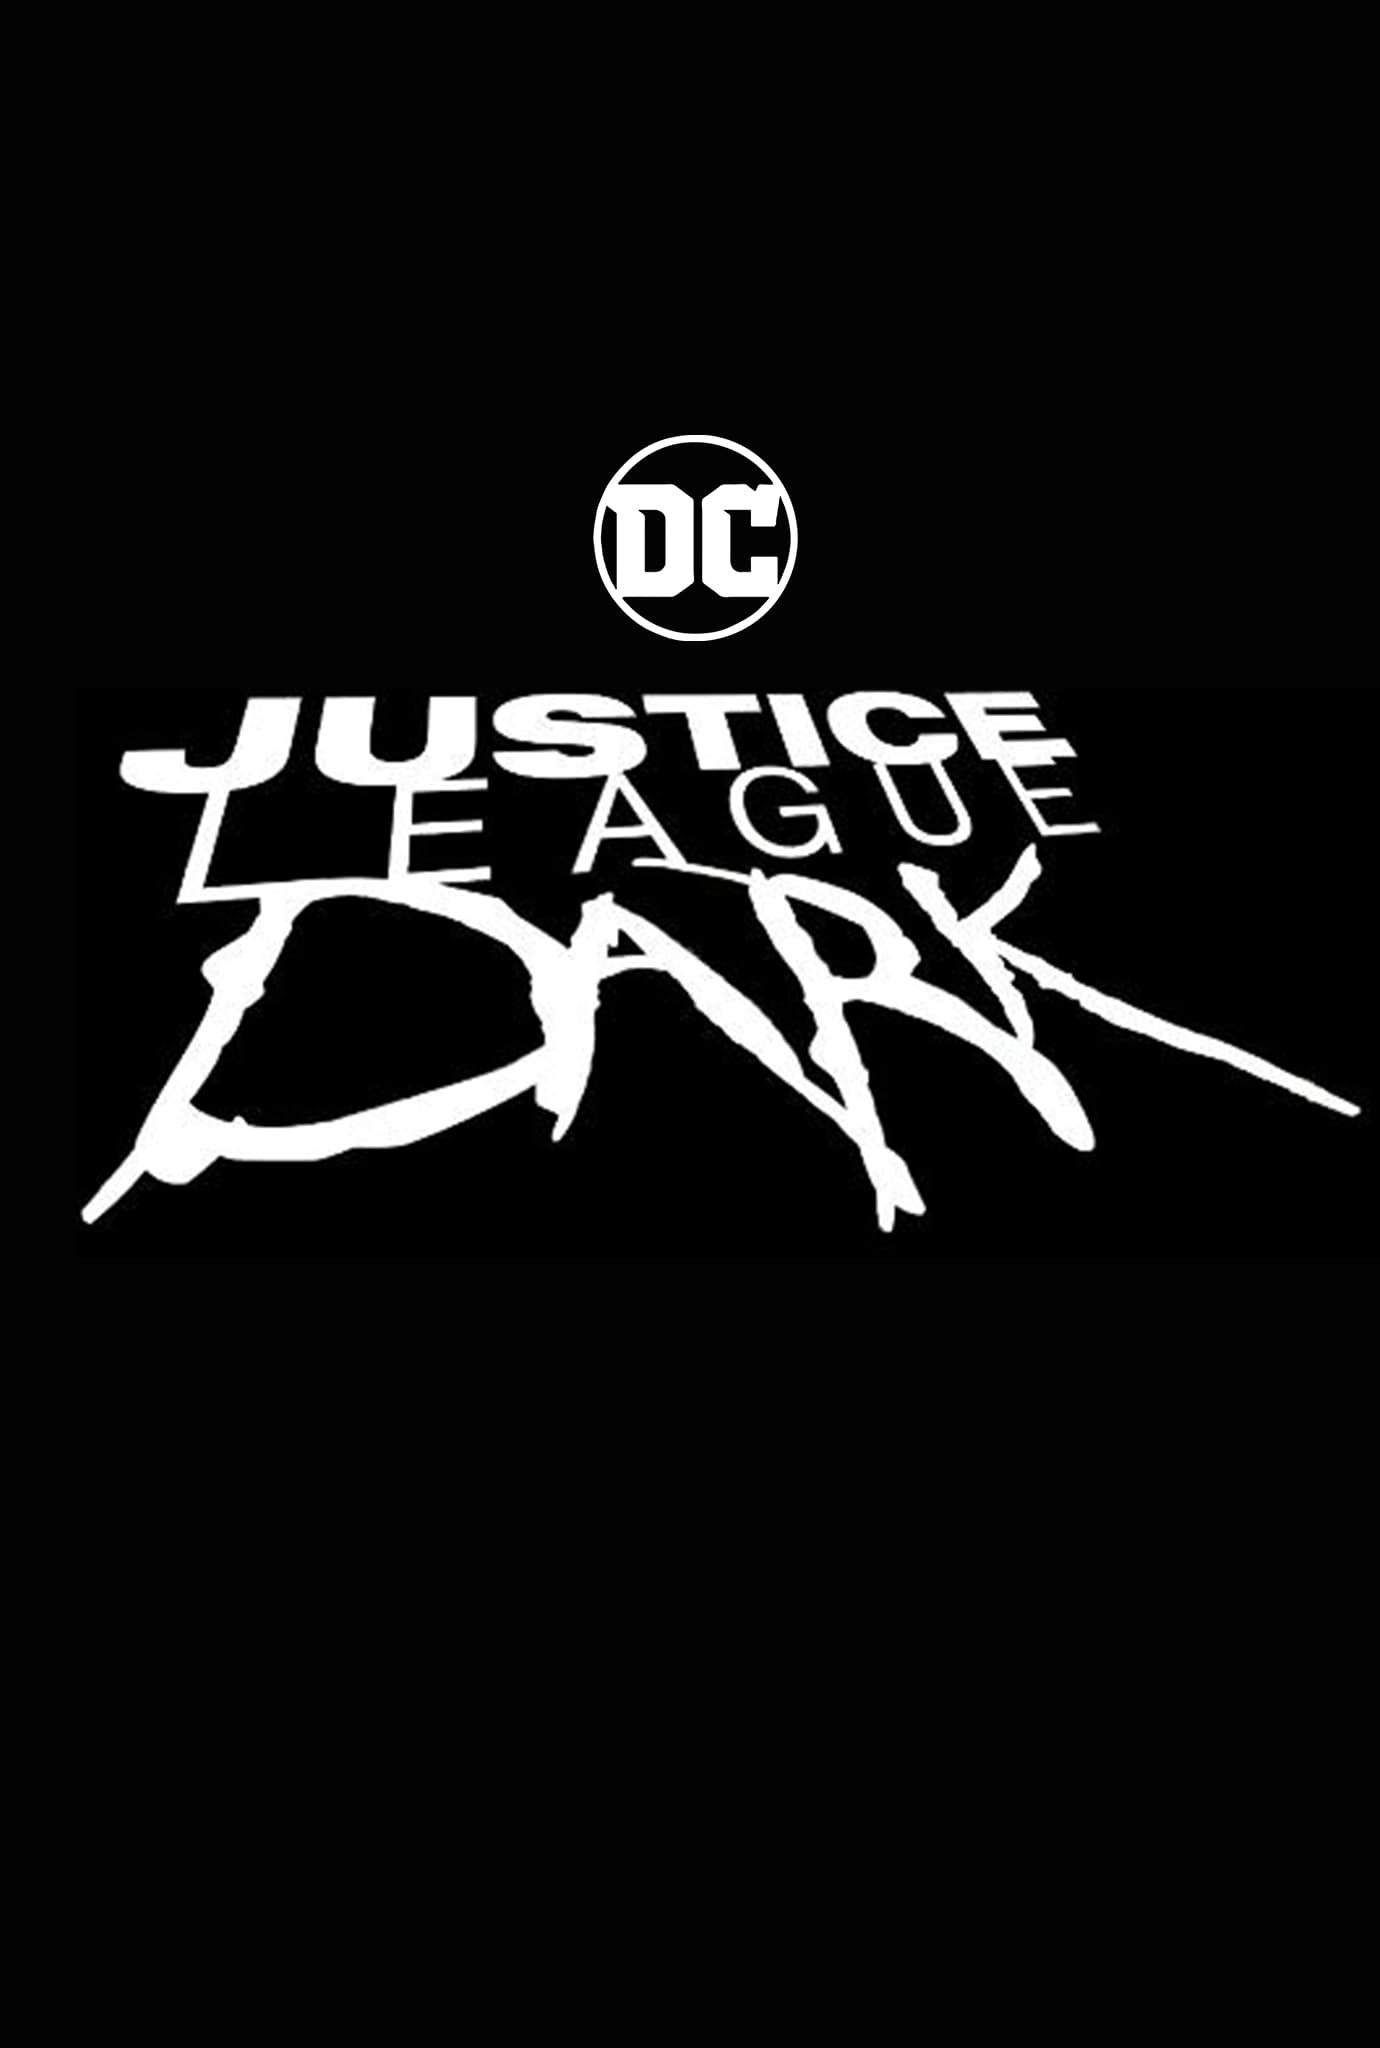 Justice League Dark (1970)